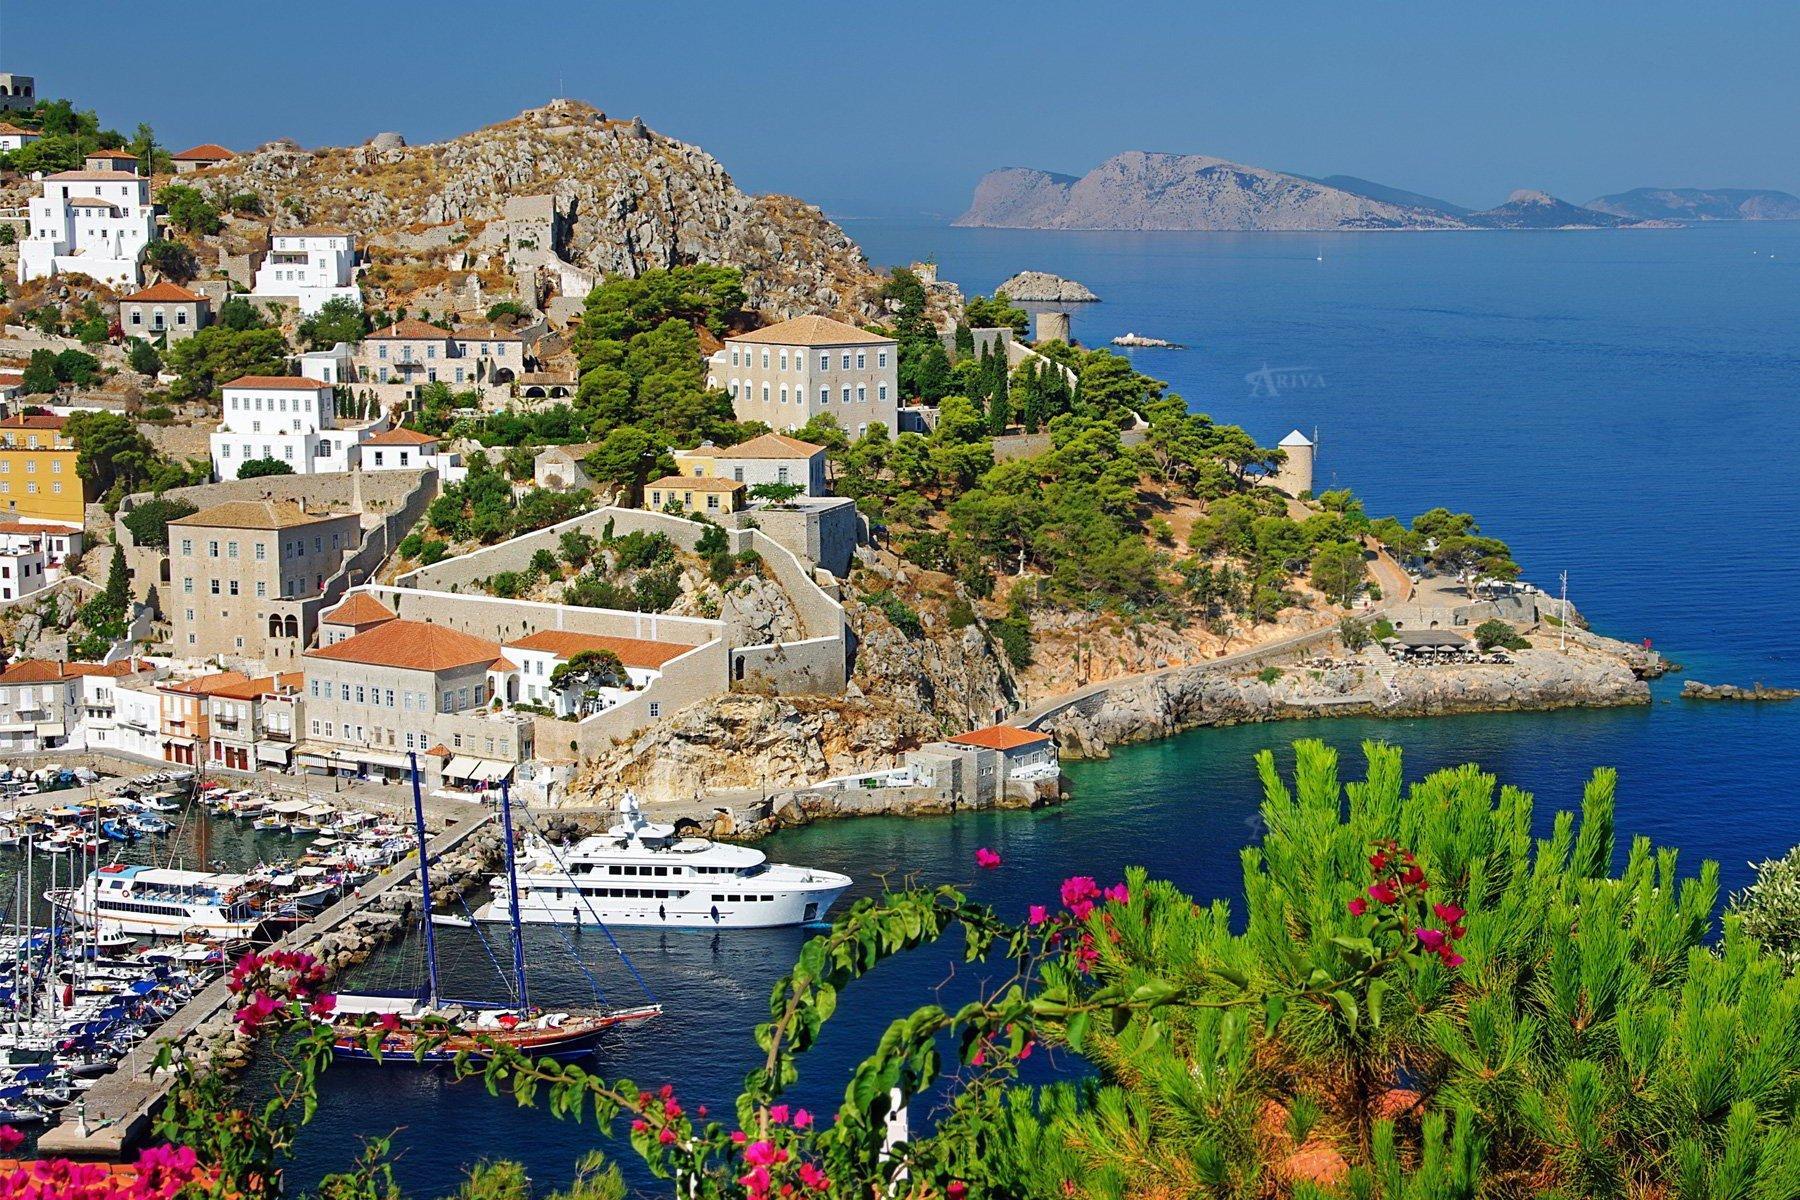 Hydra Island Harbour